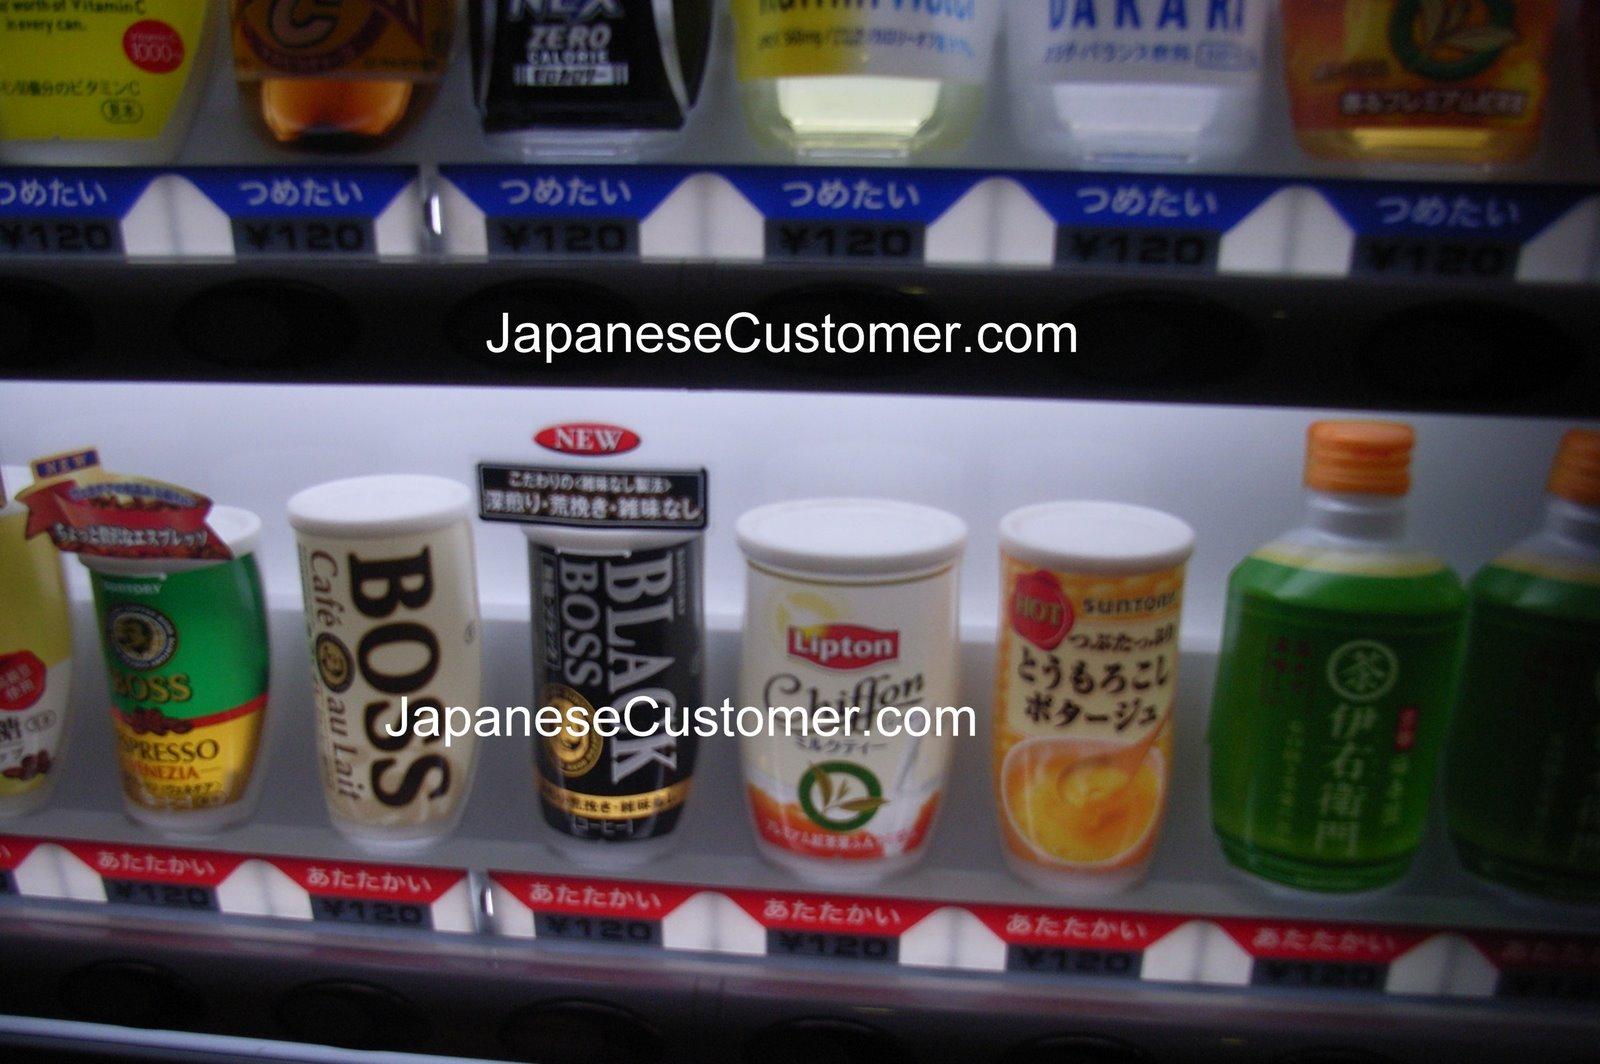 Japanese vending machine drink brands copyright peter hanami 2010